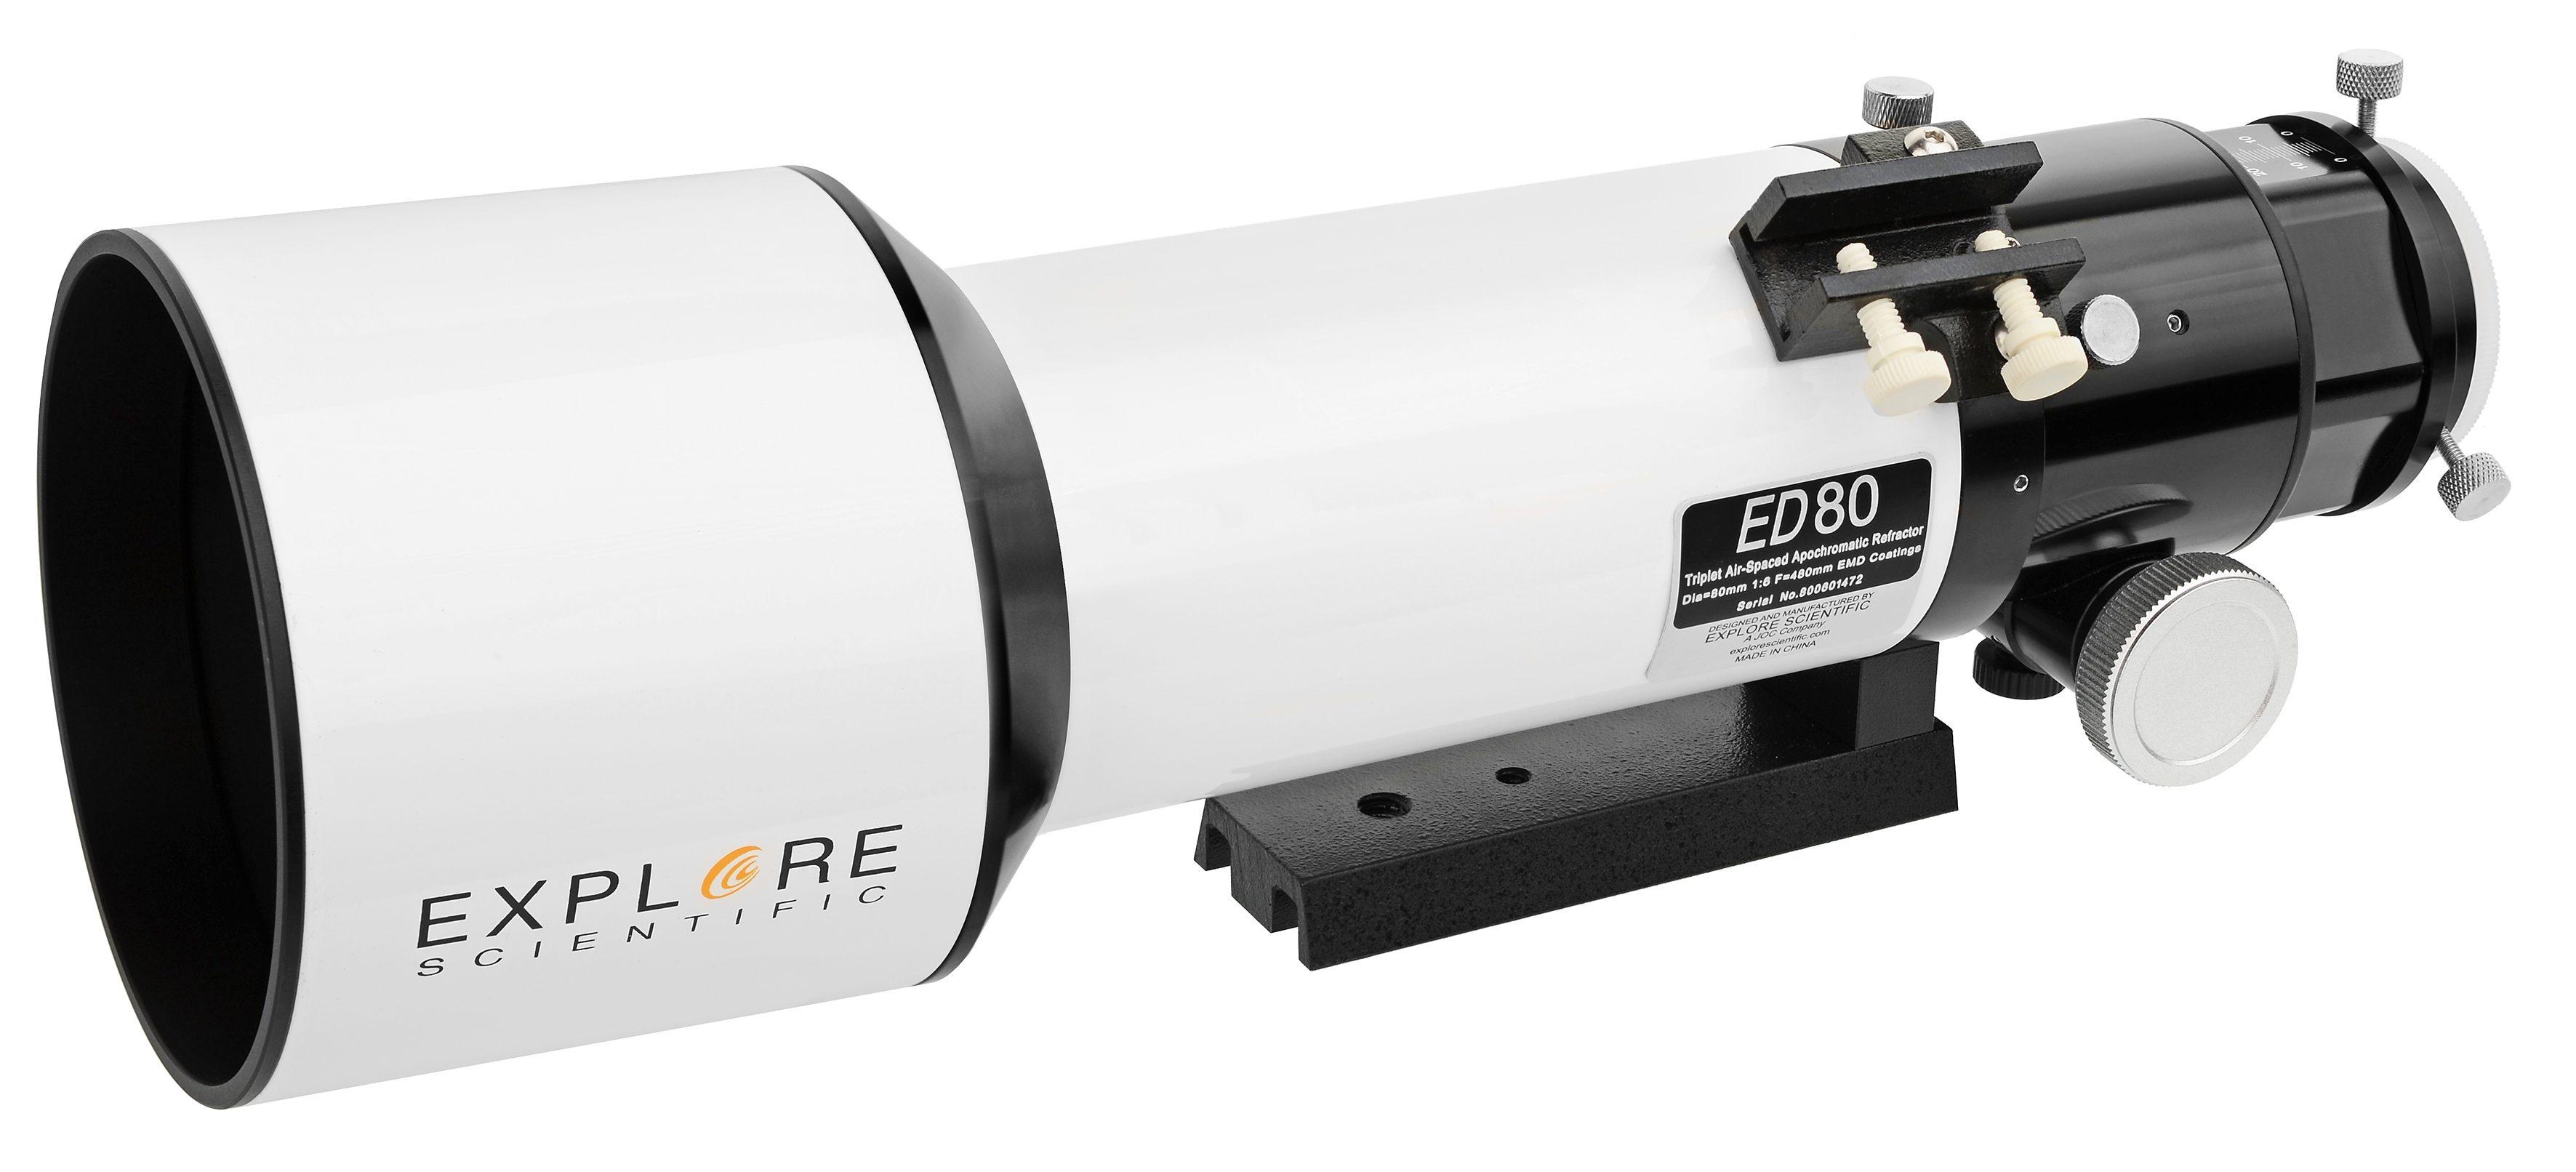 Bresser Teleskop »Explore Scientific ED APO 80mm f/6 FCD-1 Alu Hex«